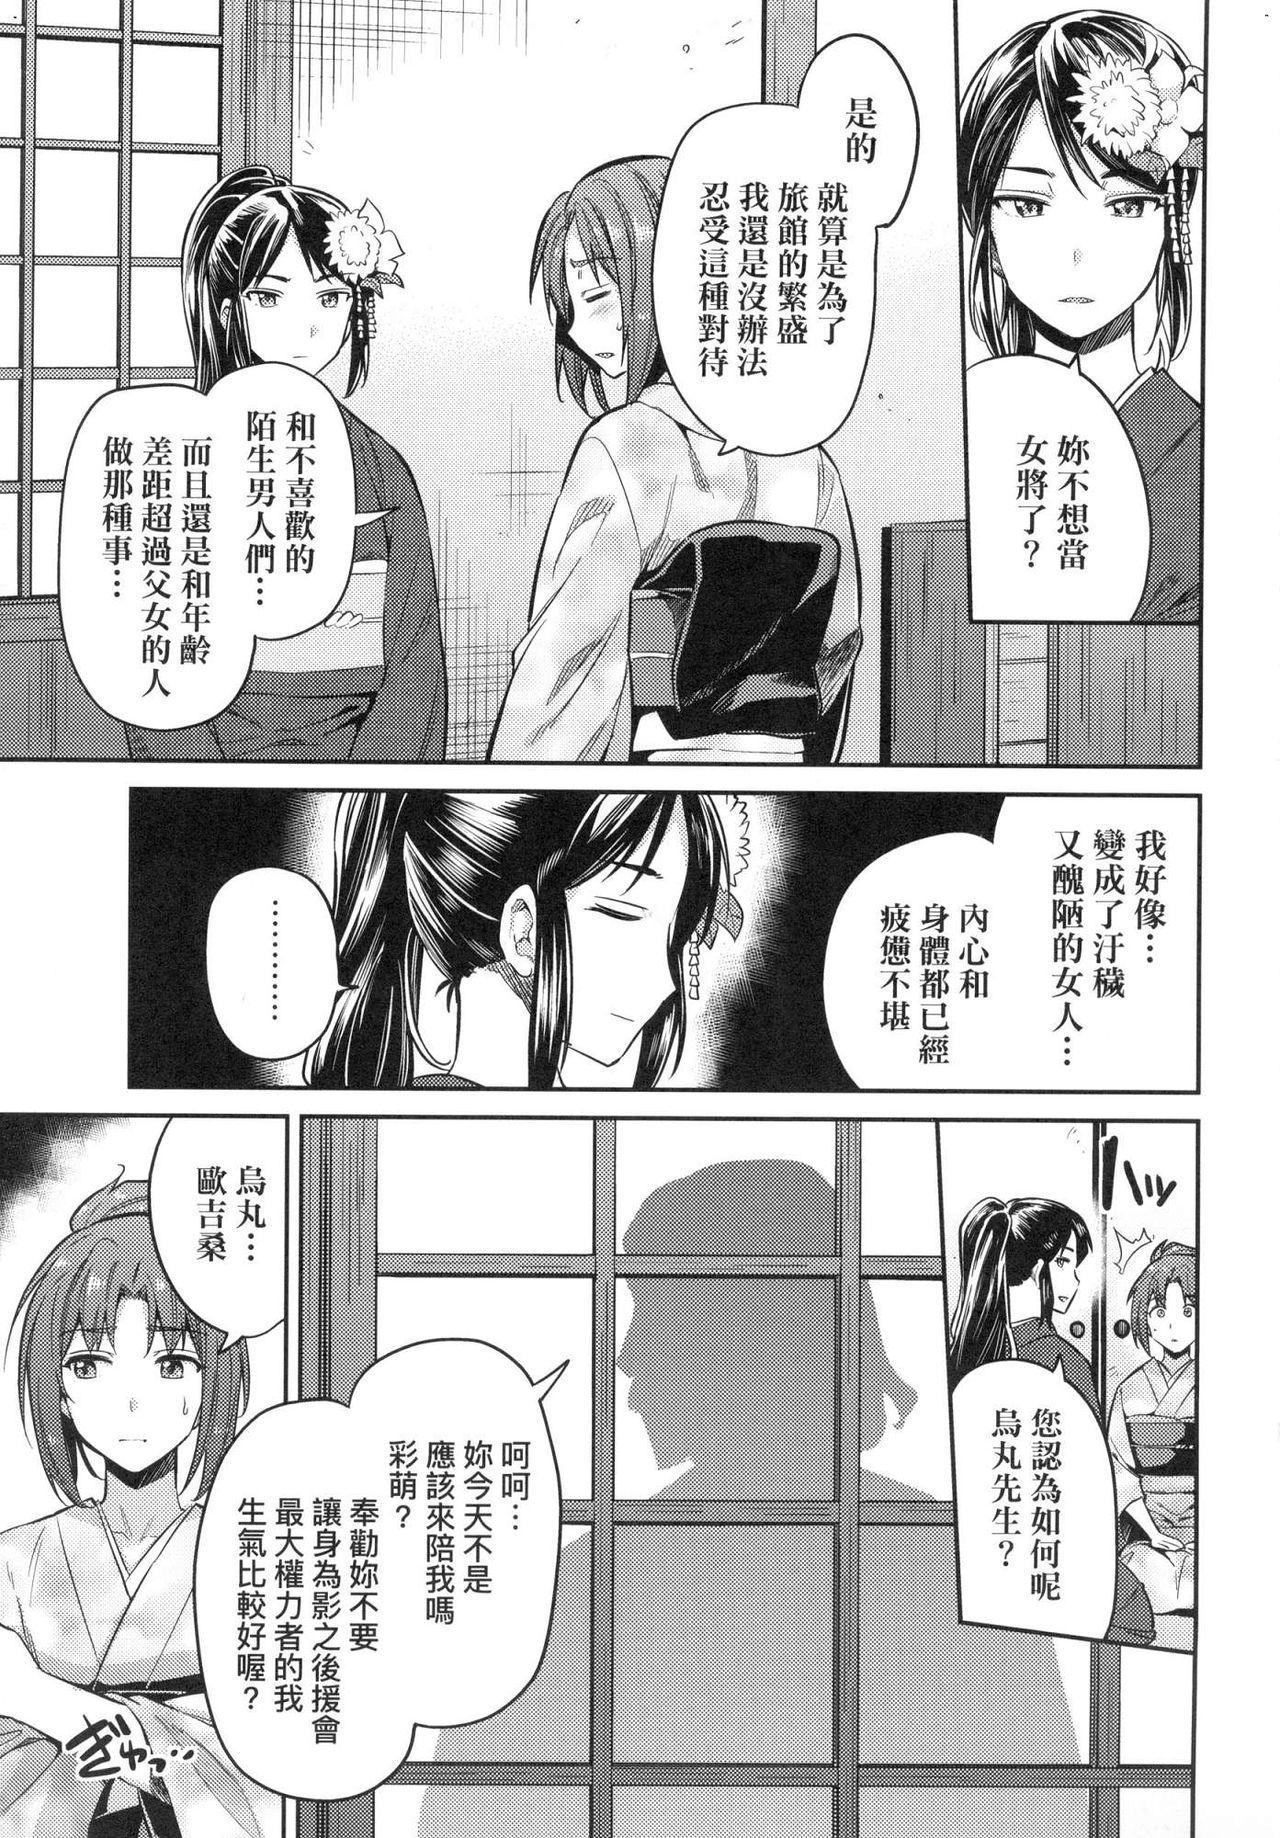 Kyousei Tanetsuke Express - Forced Seeding Express 178